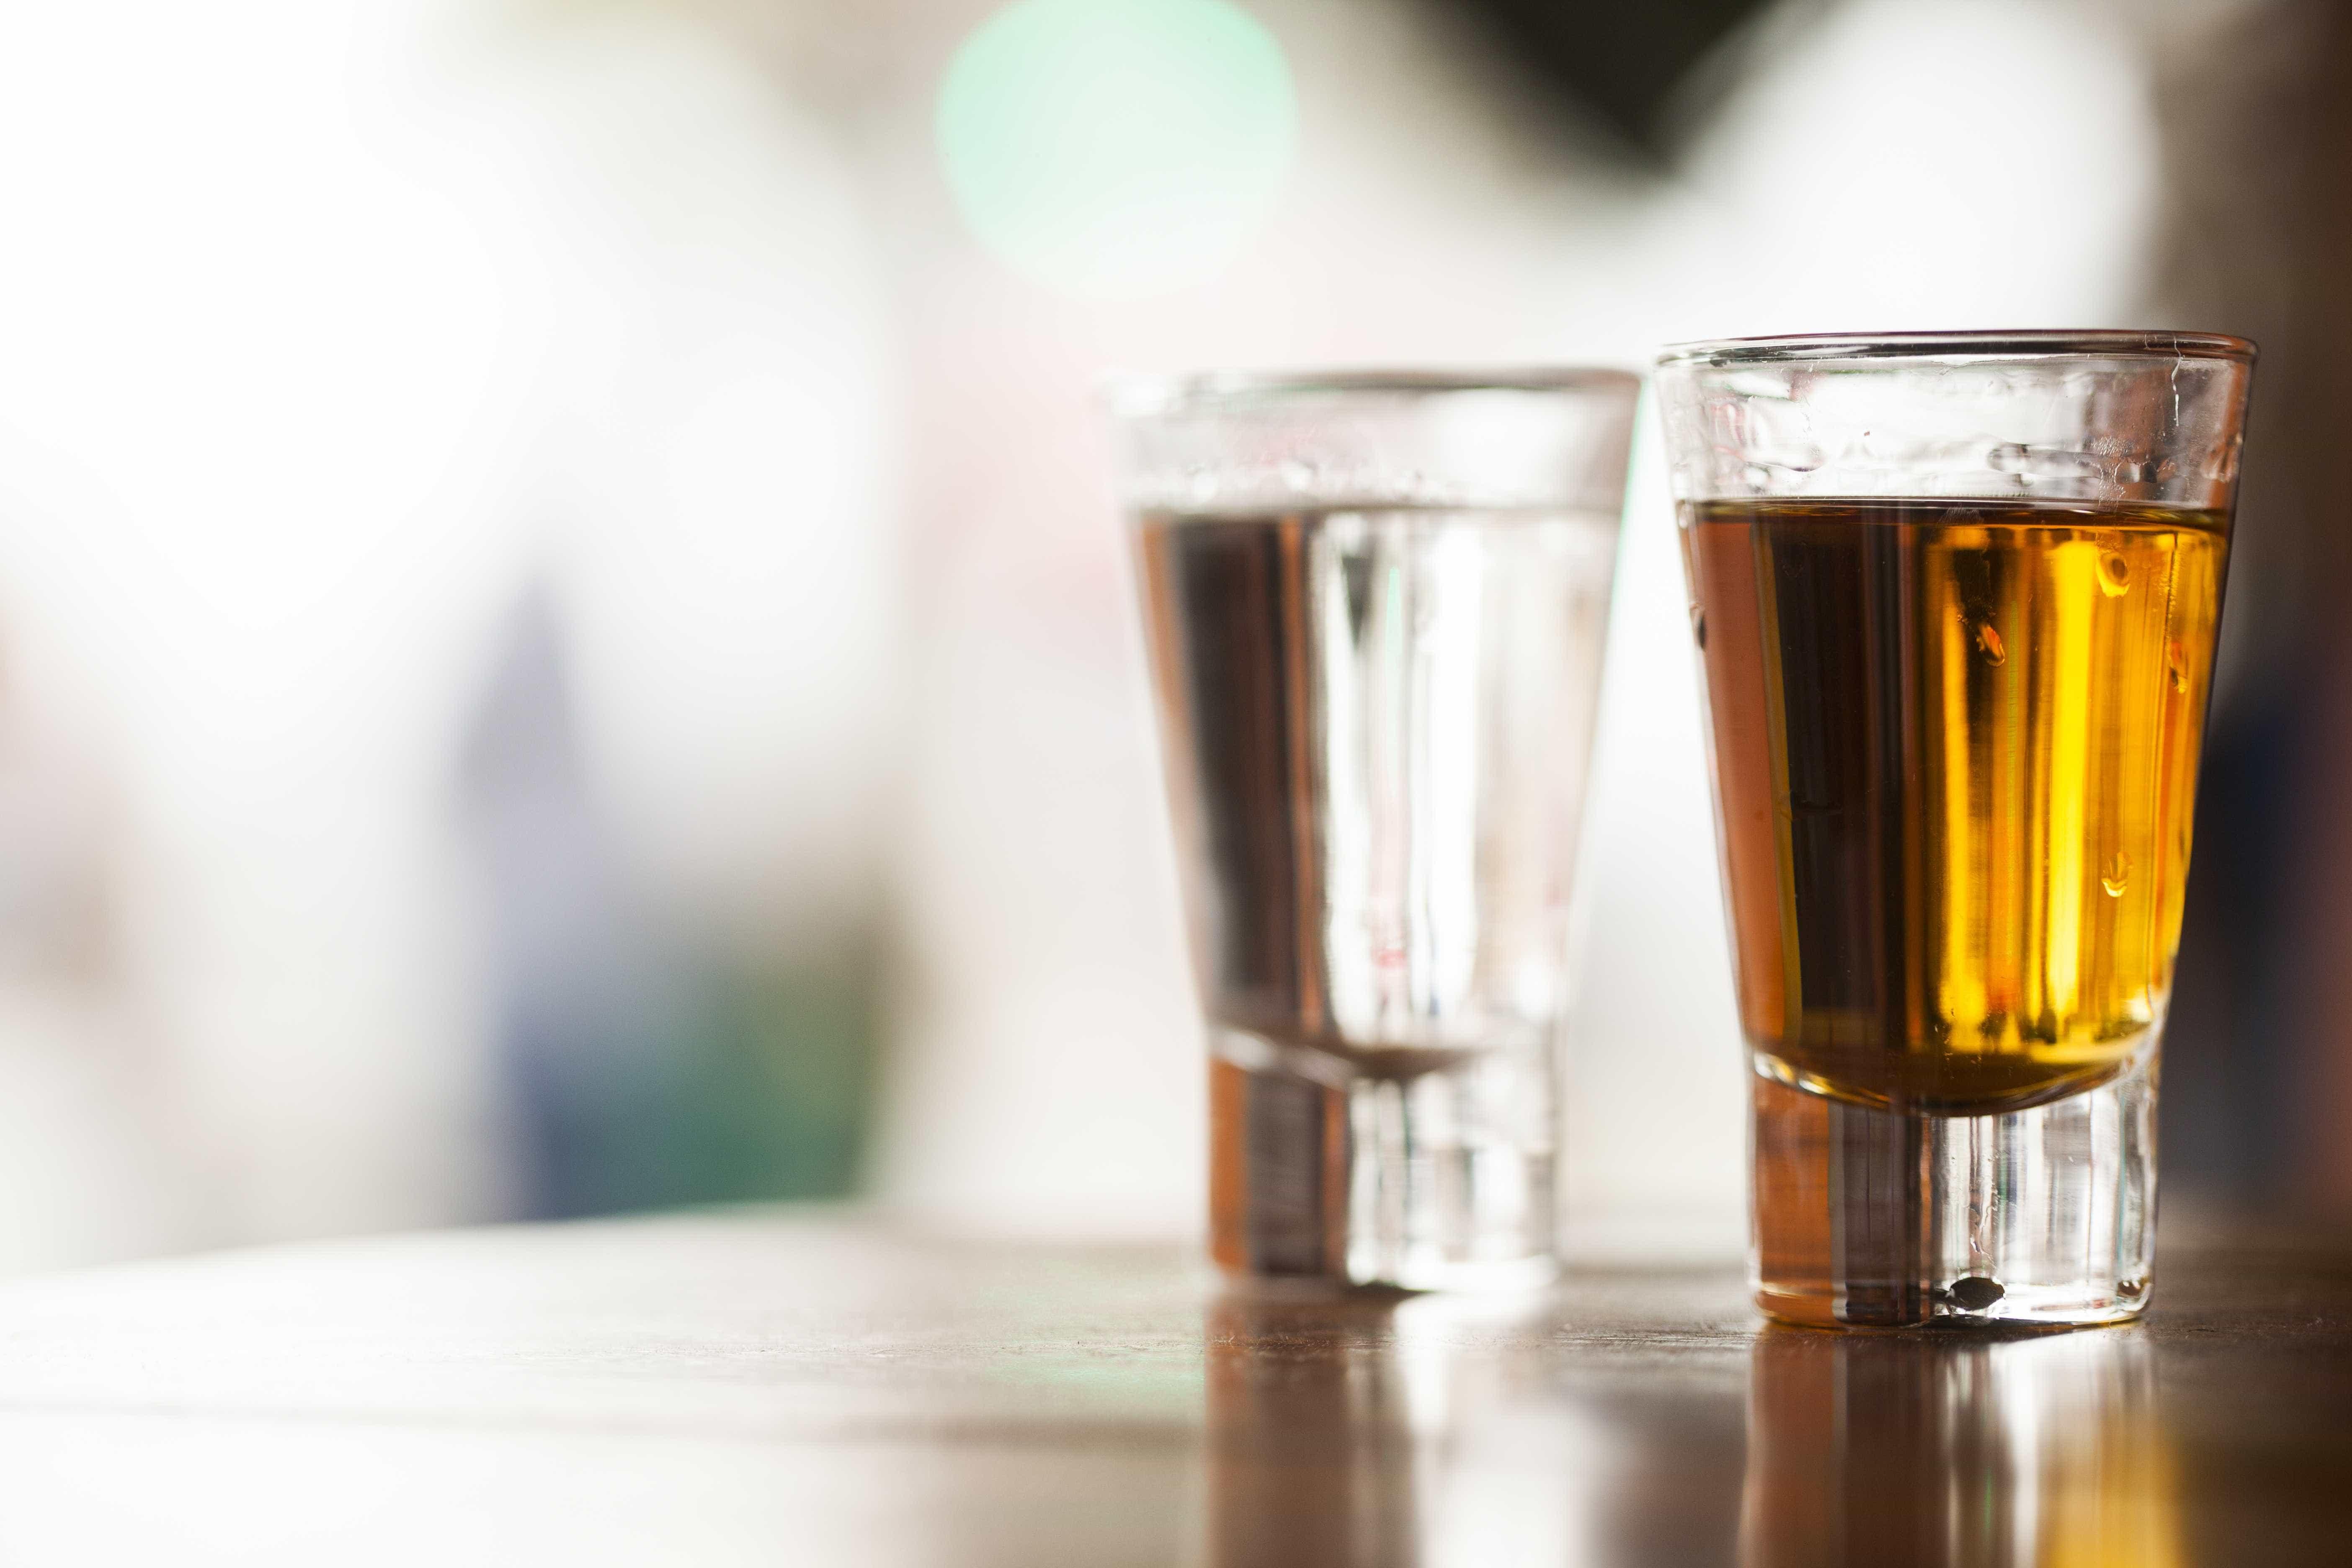 Entenda o que é o 'blackout' alcoólico e o perigo que ele representa